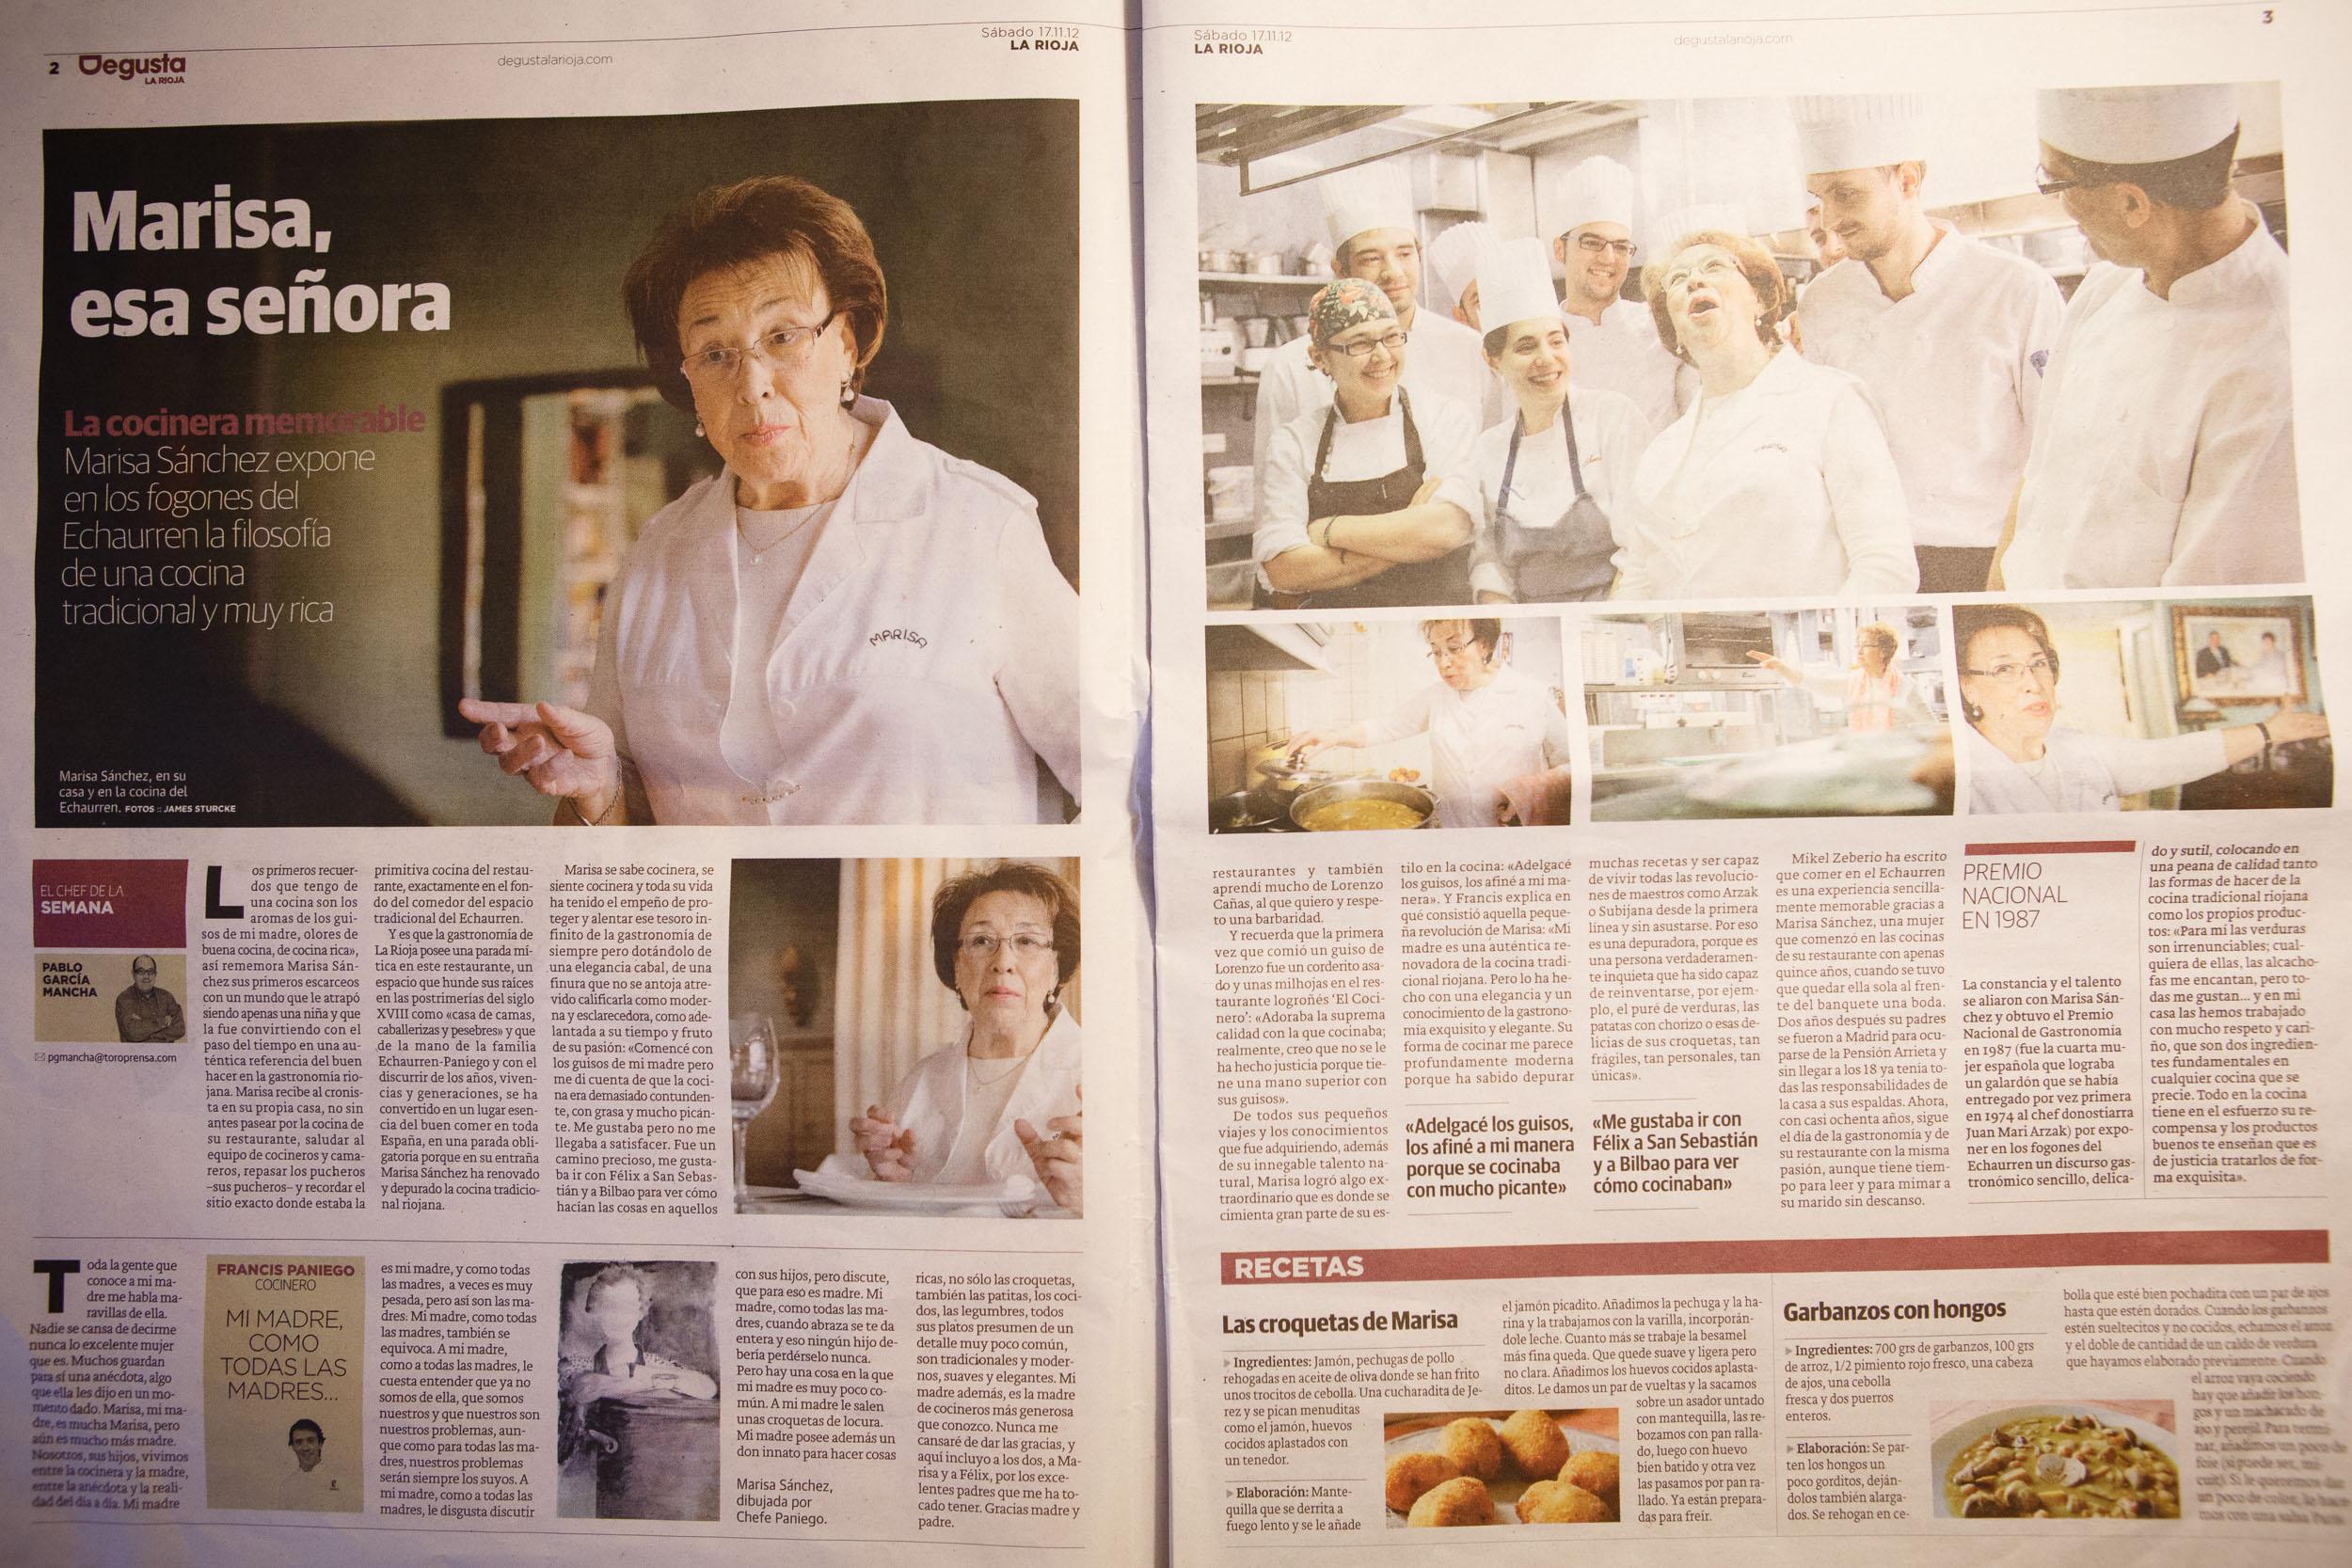 Portrait Photography La Rioja Spain - Marisa Sánchez of Hotel Echaurren Ezcaray - James Sturcke Photographer | sturcke.org_011.jpg